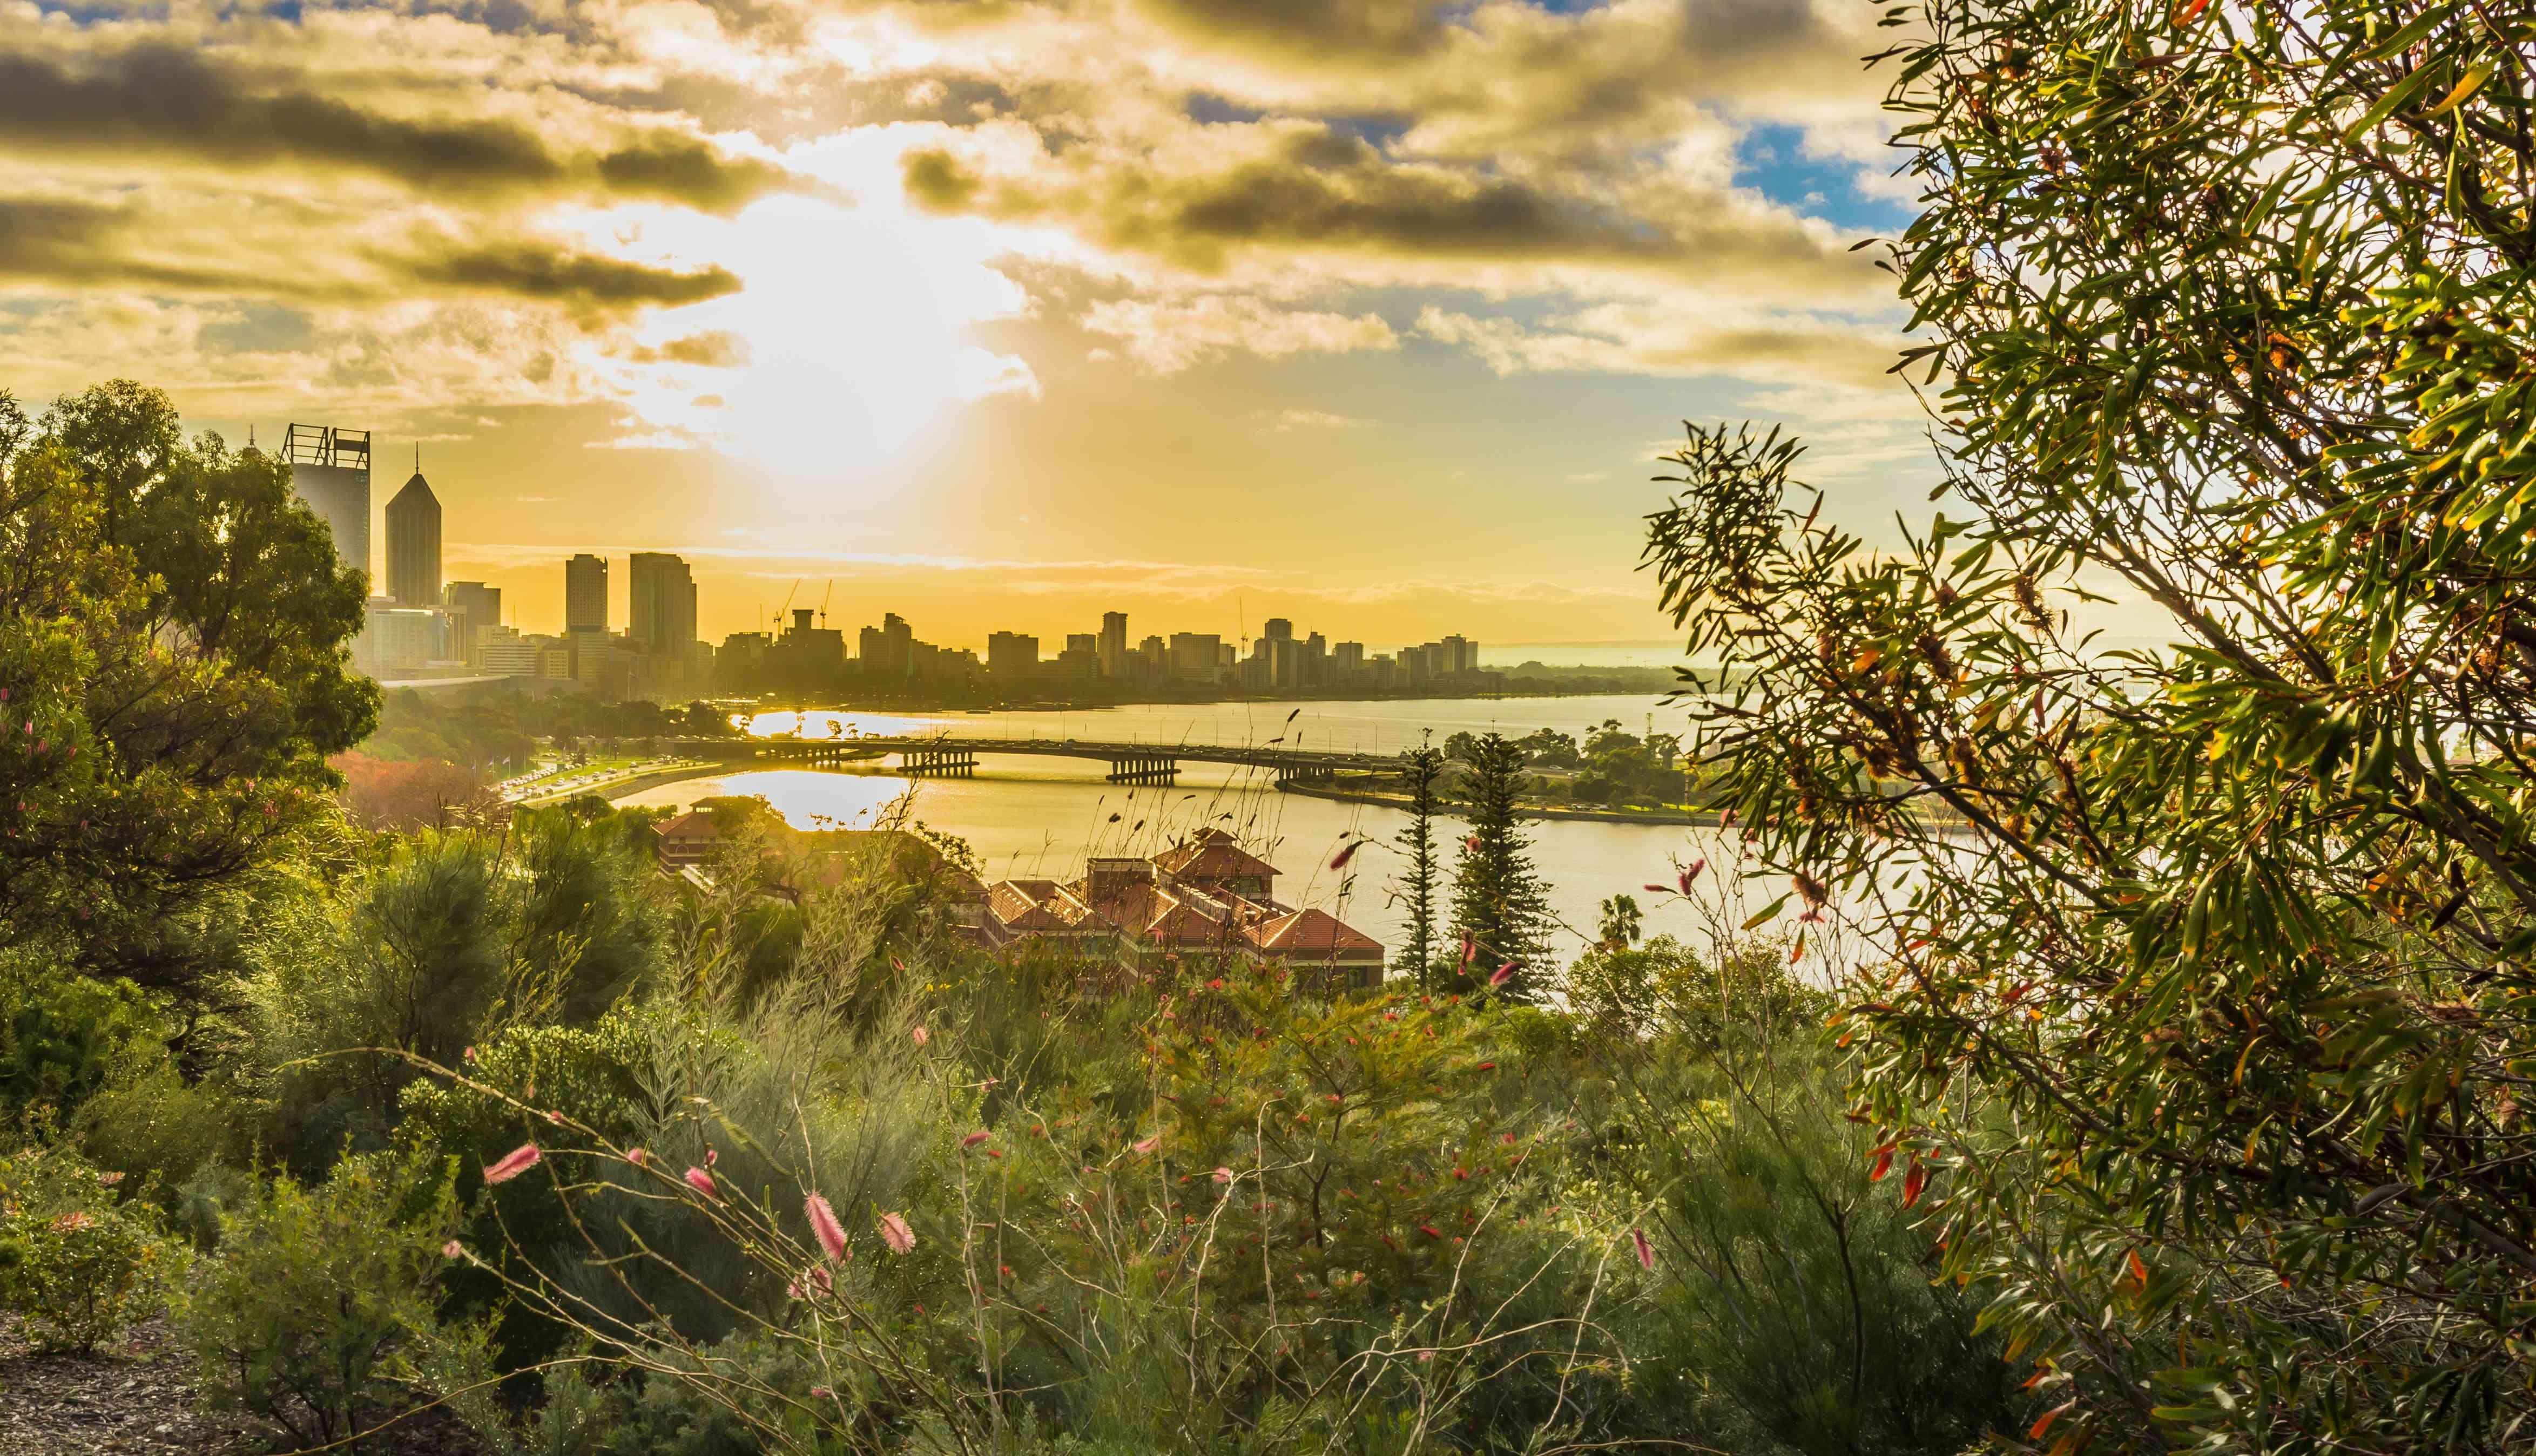 Sunrise of Perth City view at Mount Eliza, Western Australia, Australia